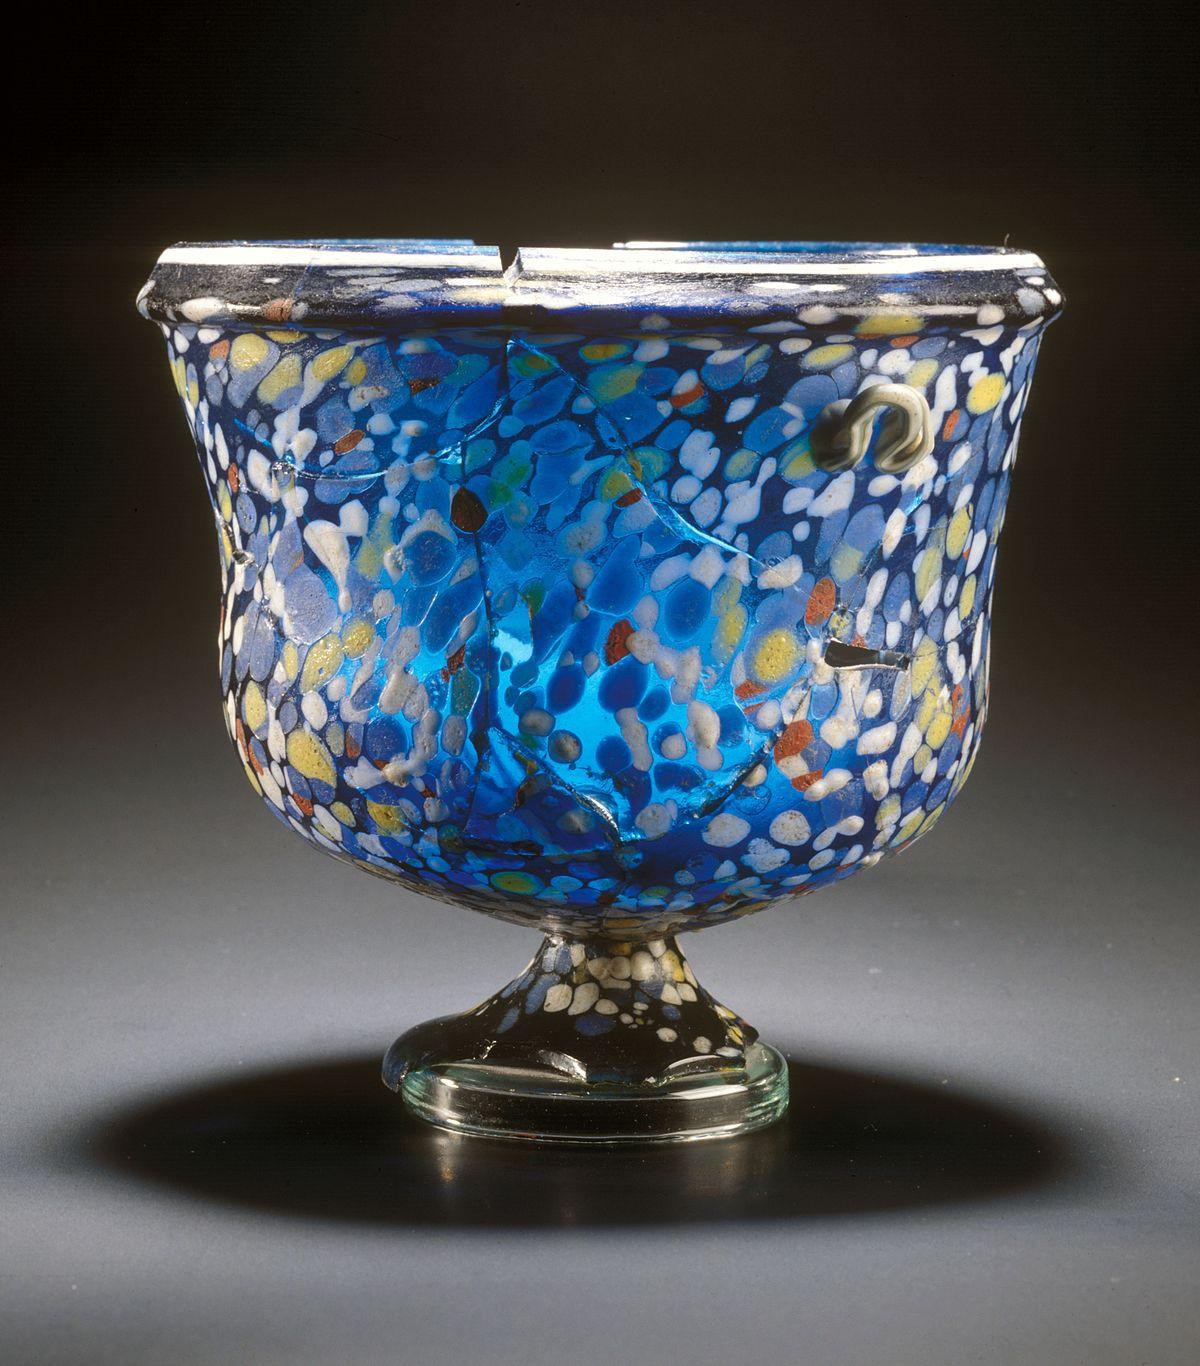 blue glass vases cheap of 13 new blue tall glass vase bogekompresorturkiye com inside blue tall glass vase unique glass art of blue tall glass vase